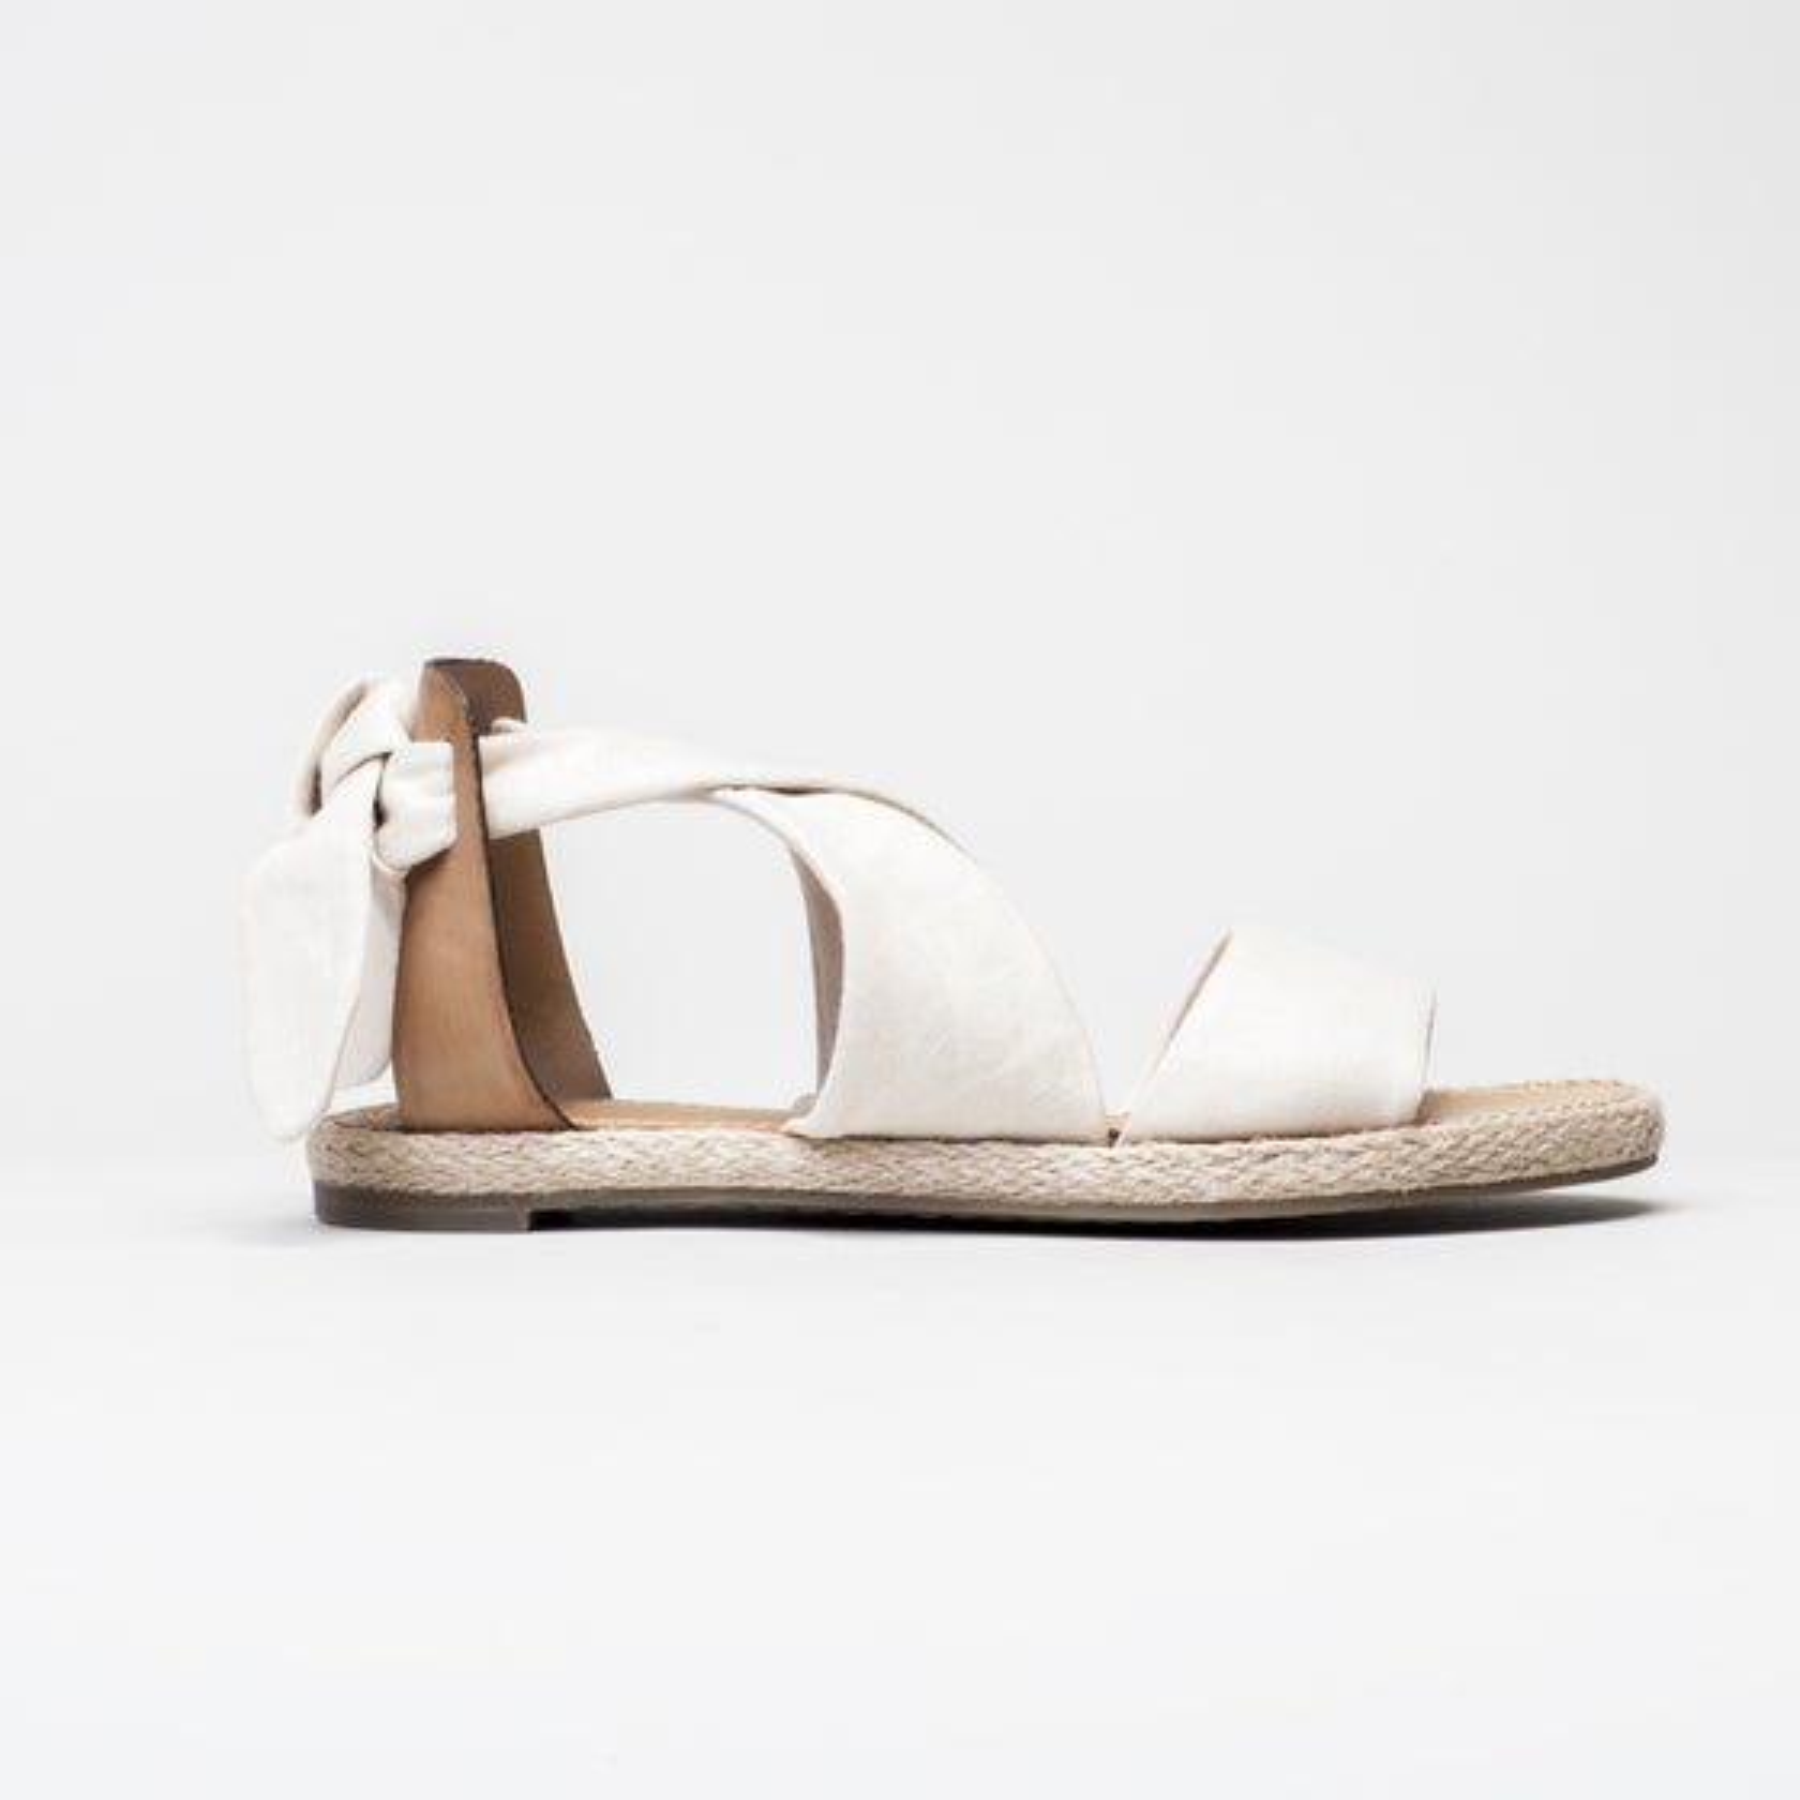 2016 Seavees Womens Bayside Sandal in Natural